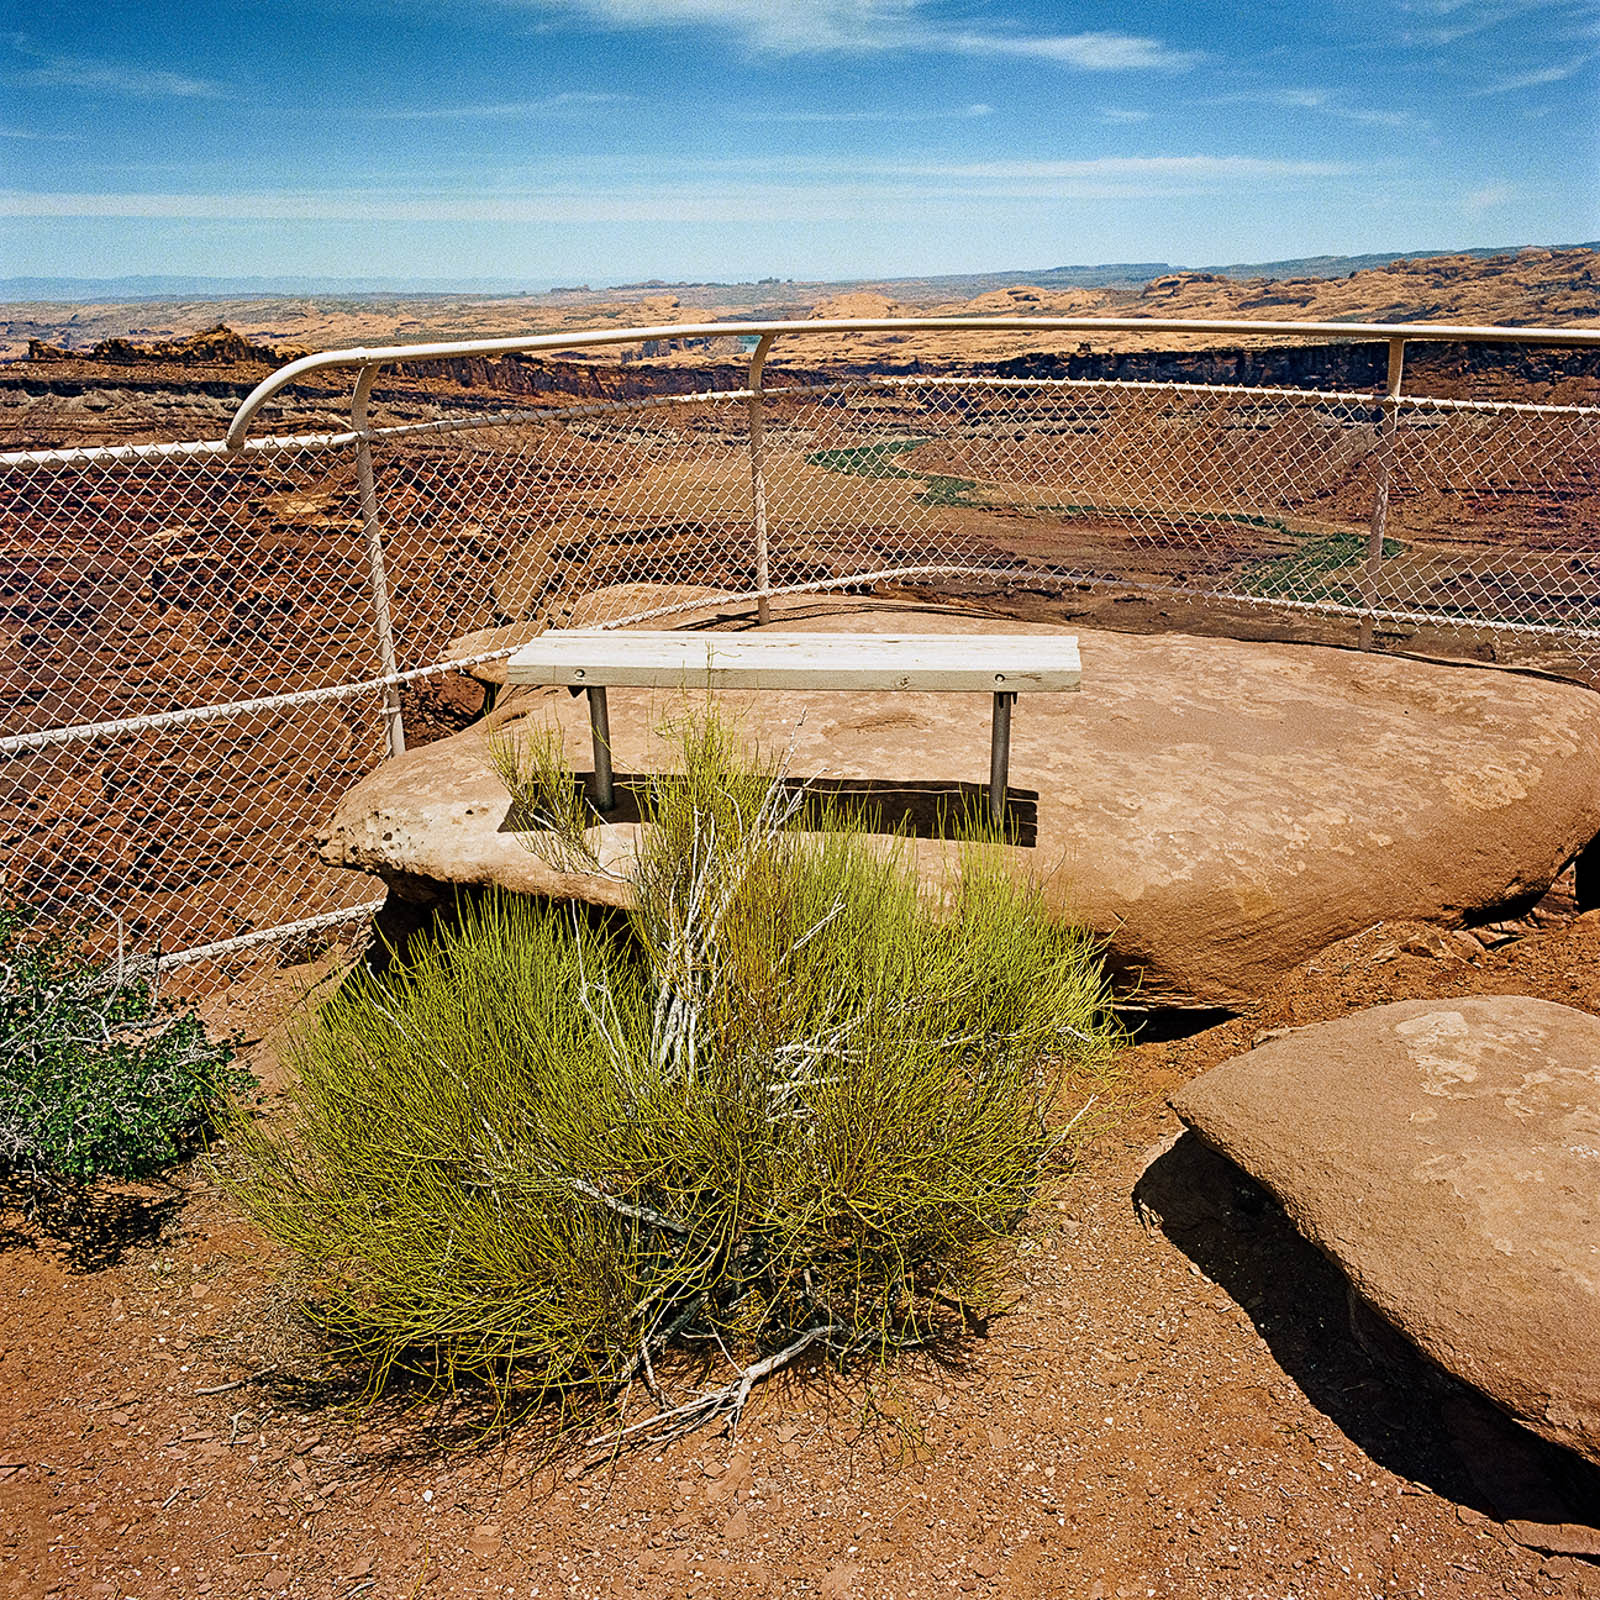 Overlook at Canyonlands National Park, Utah 1980